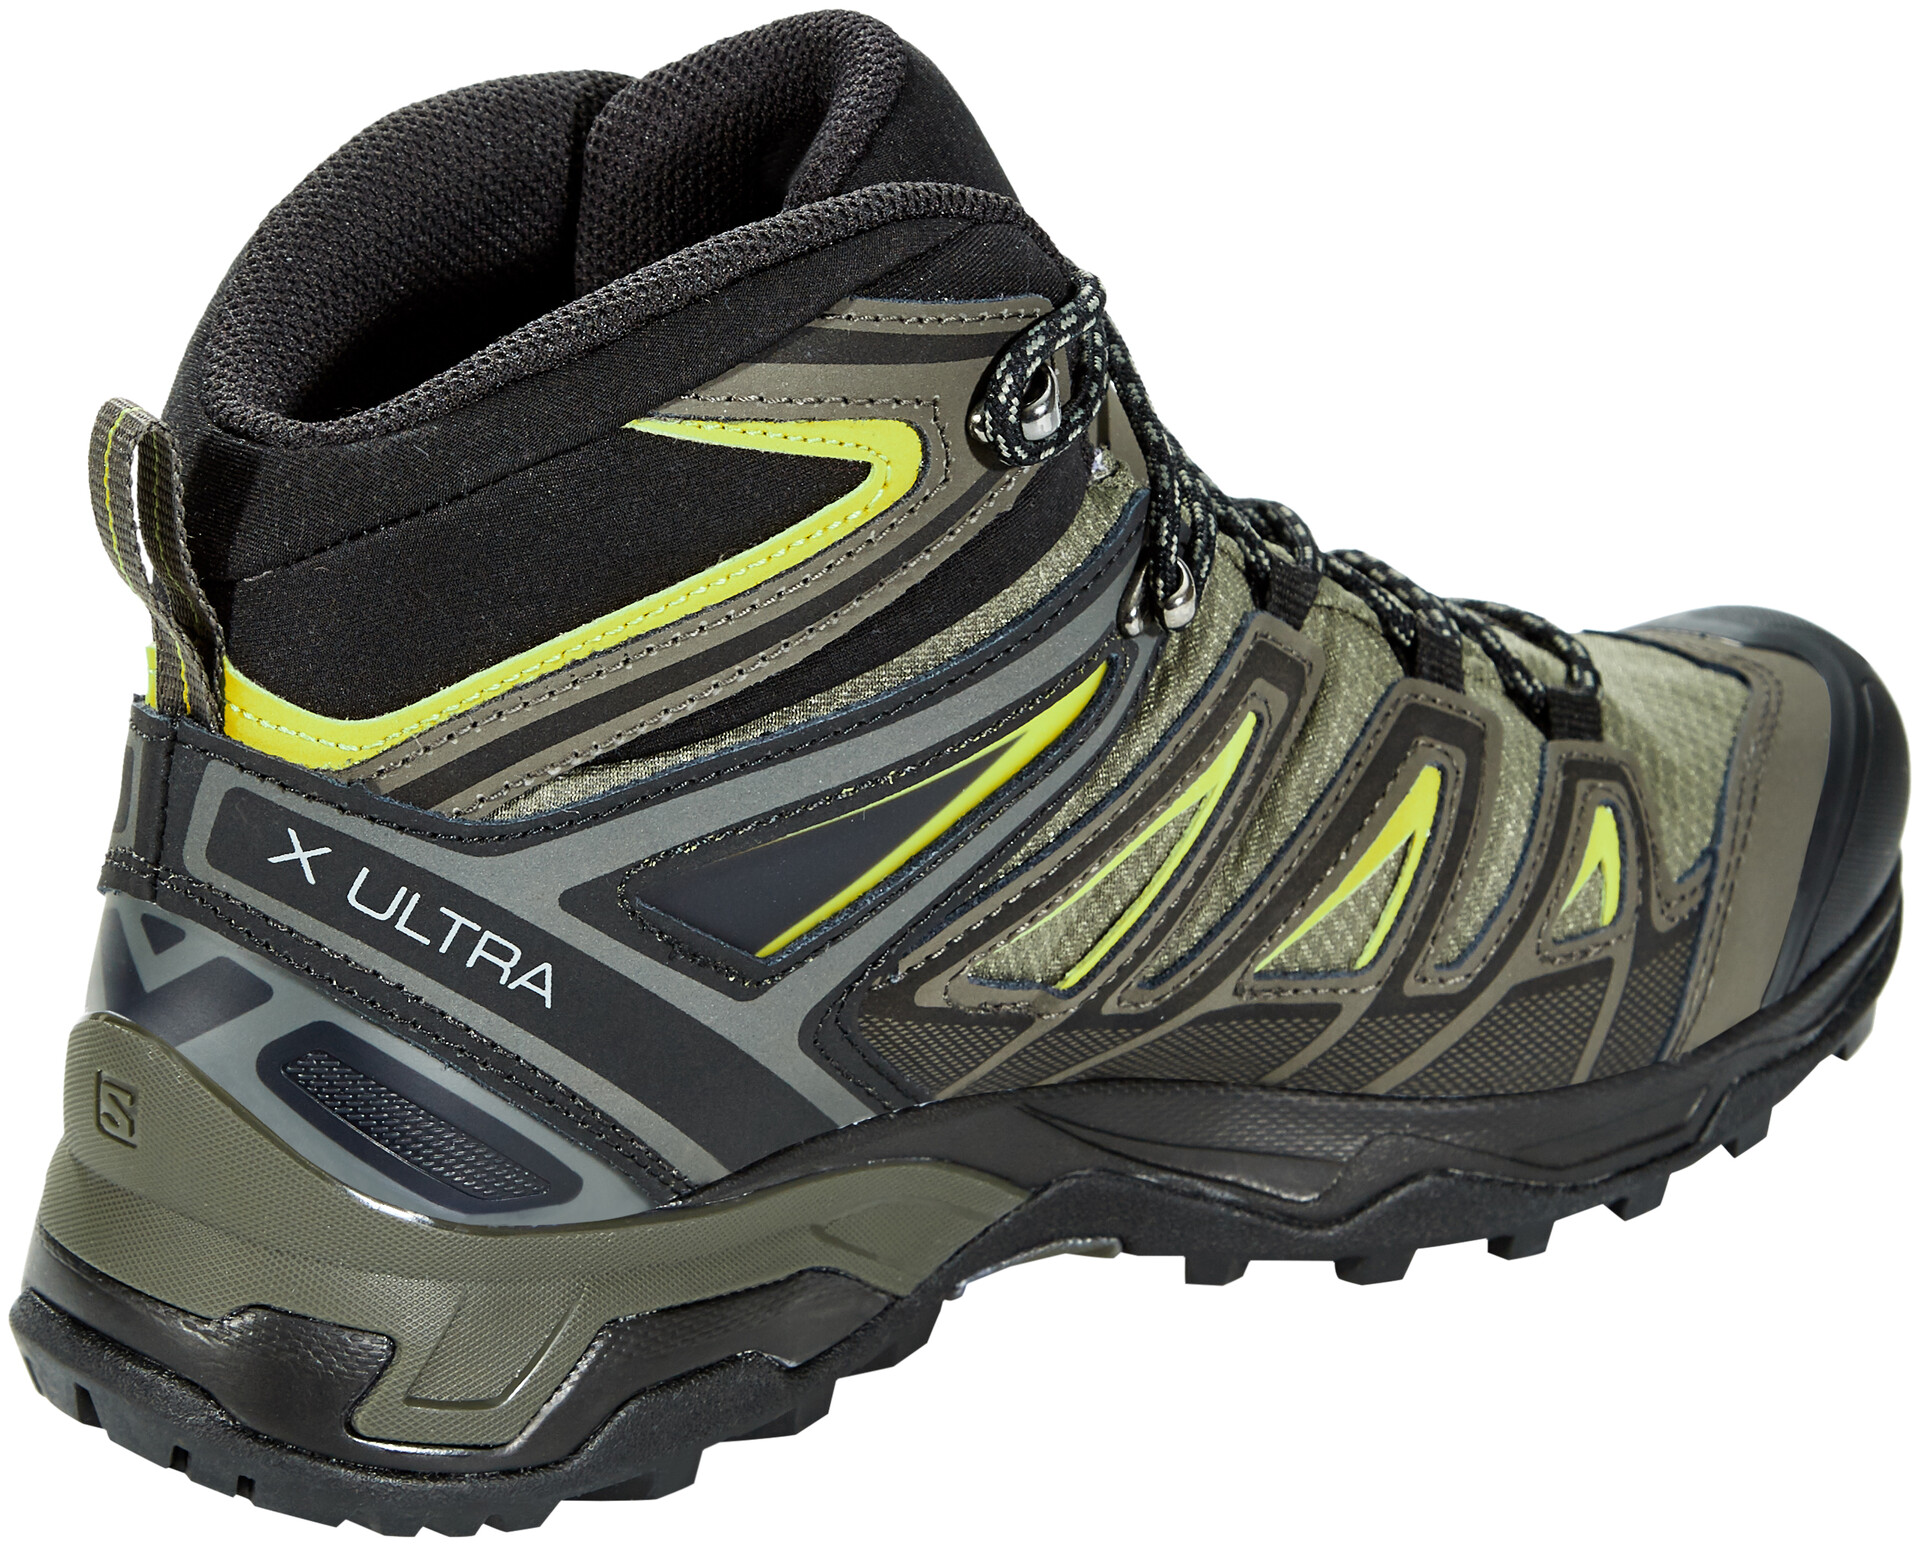 Mid Gtx X Salomon Ultra Grayblackgreen Sulphur 3 Herren Shoes Castor wTOPXikZu